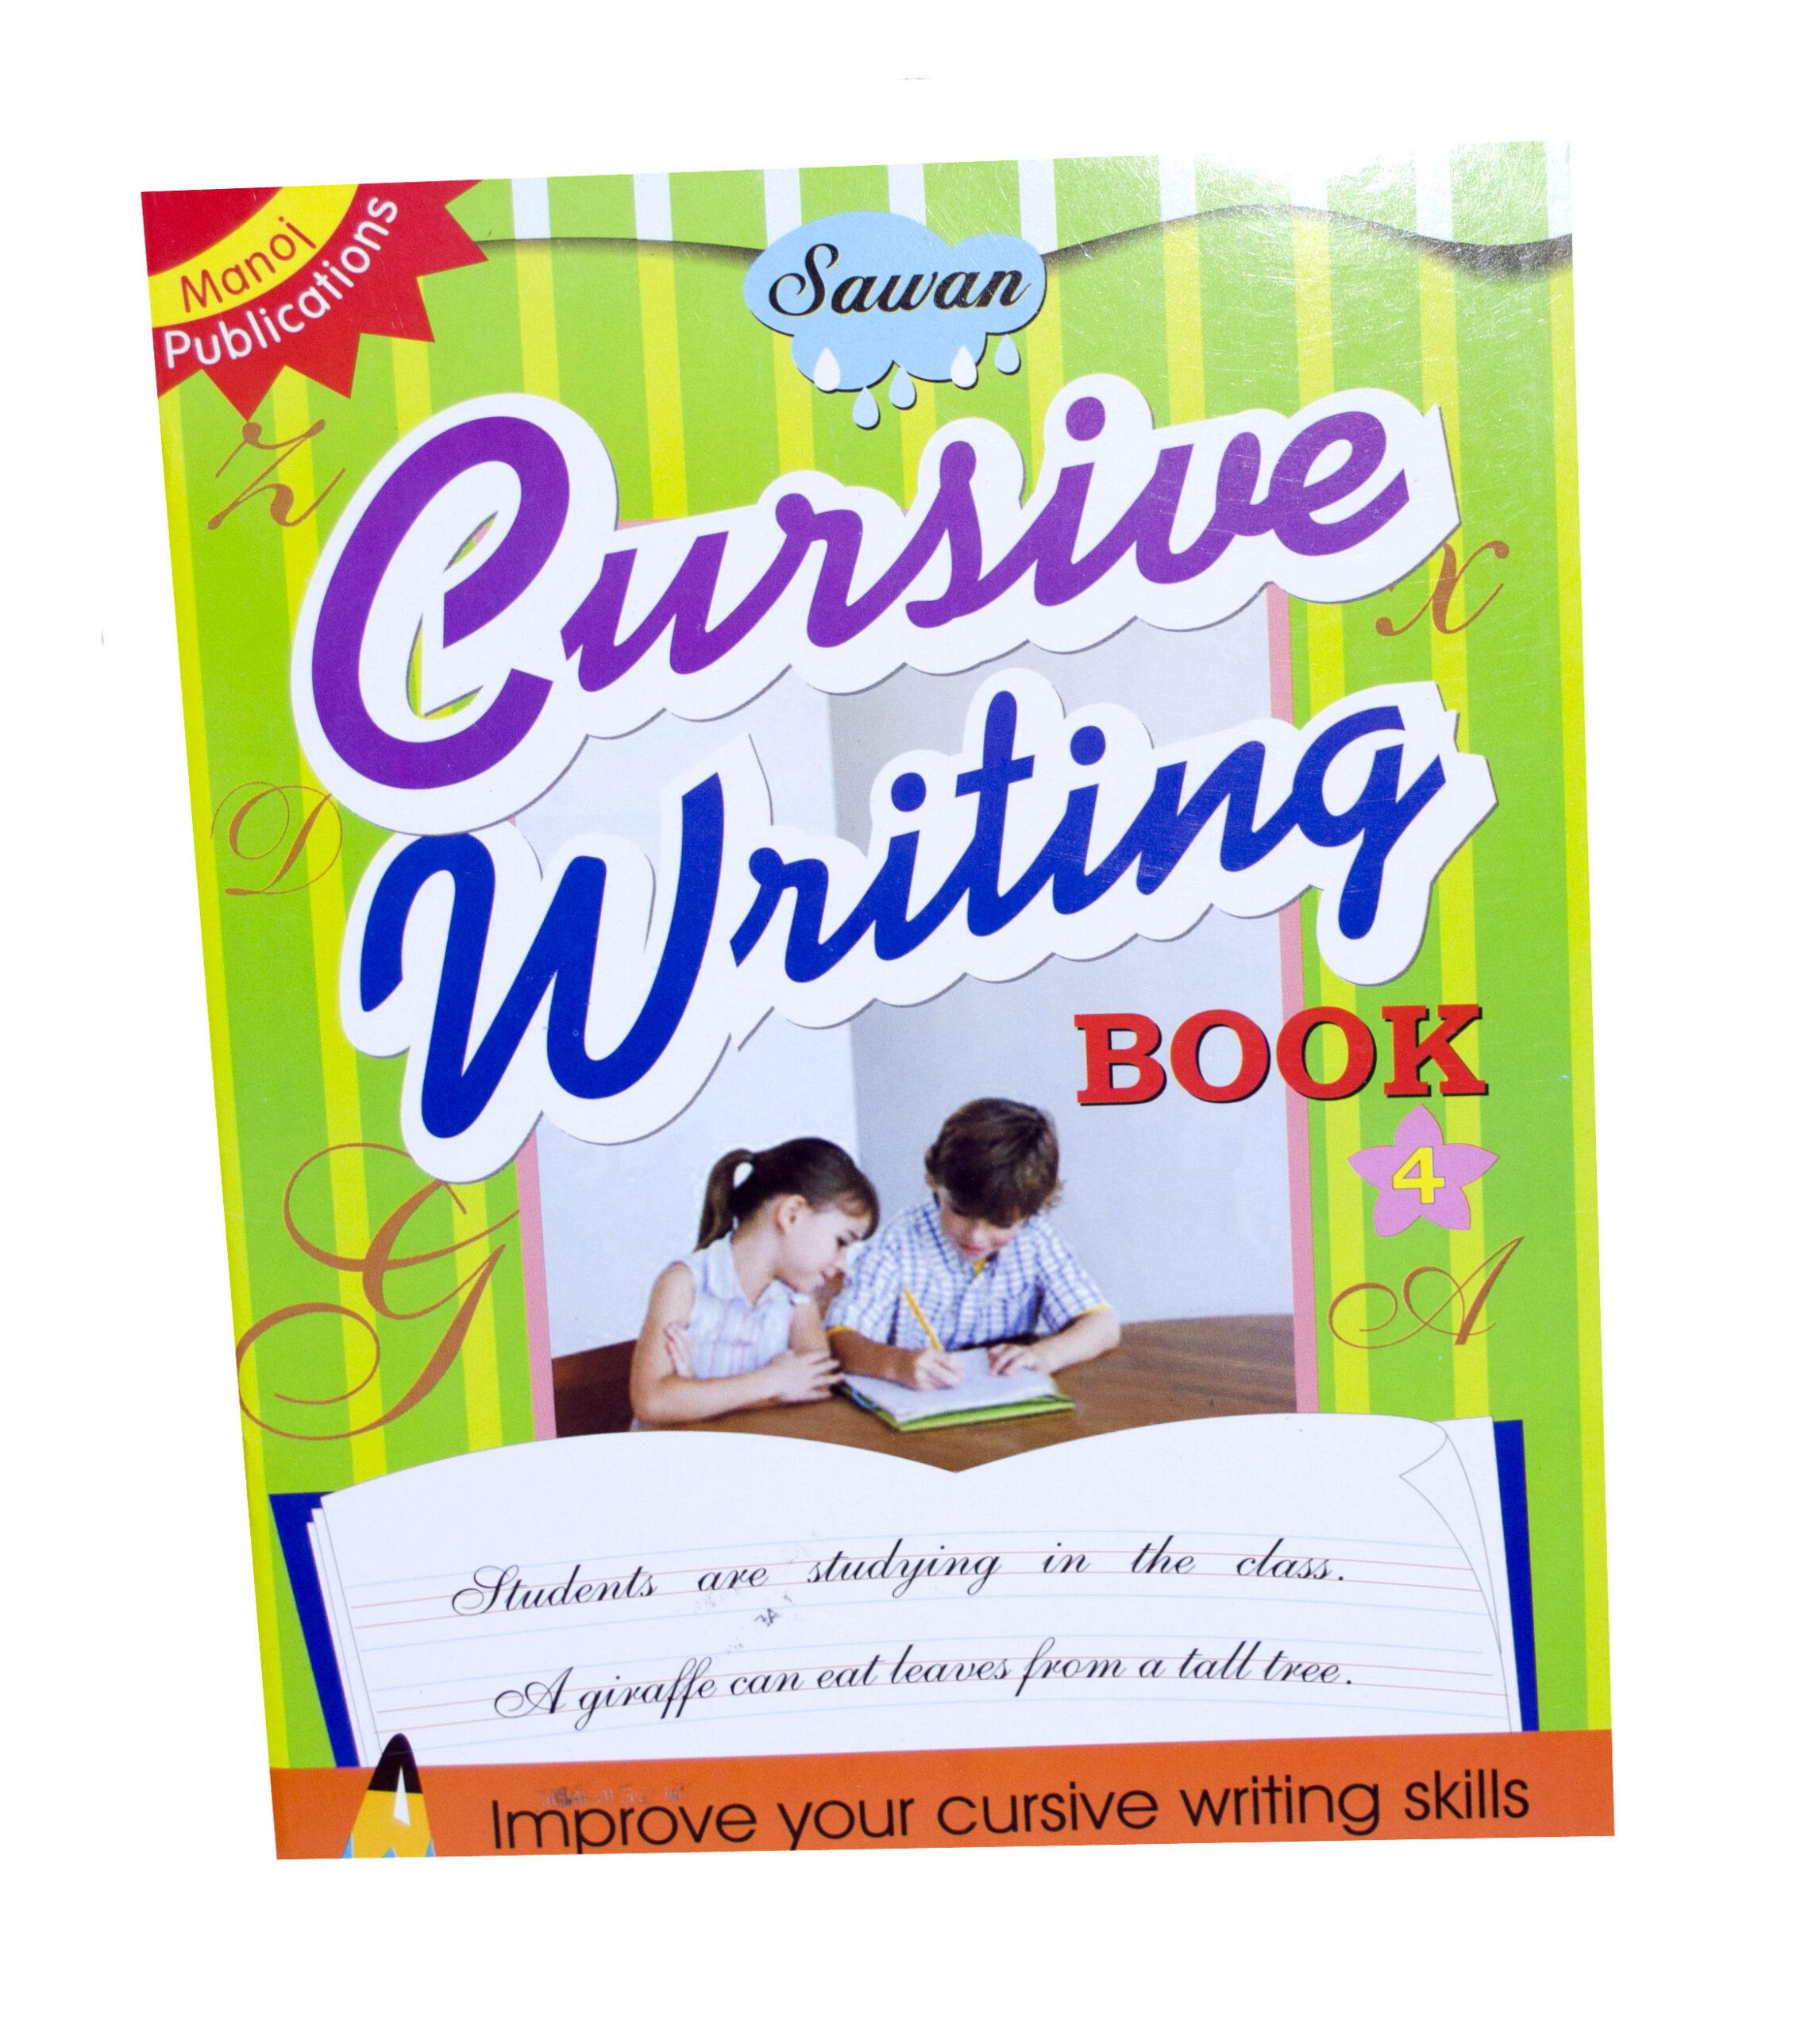 Cursive Writing Book 4